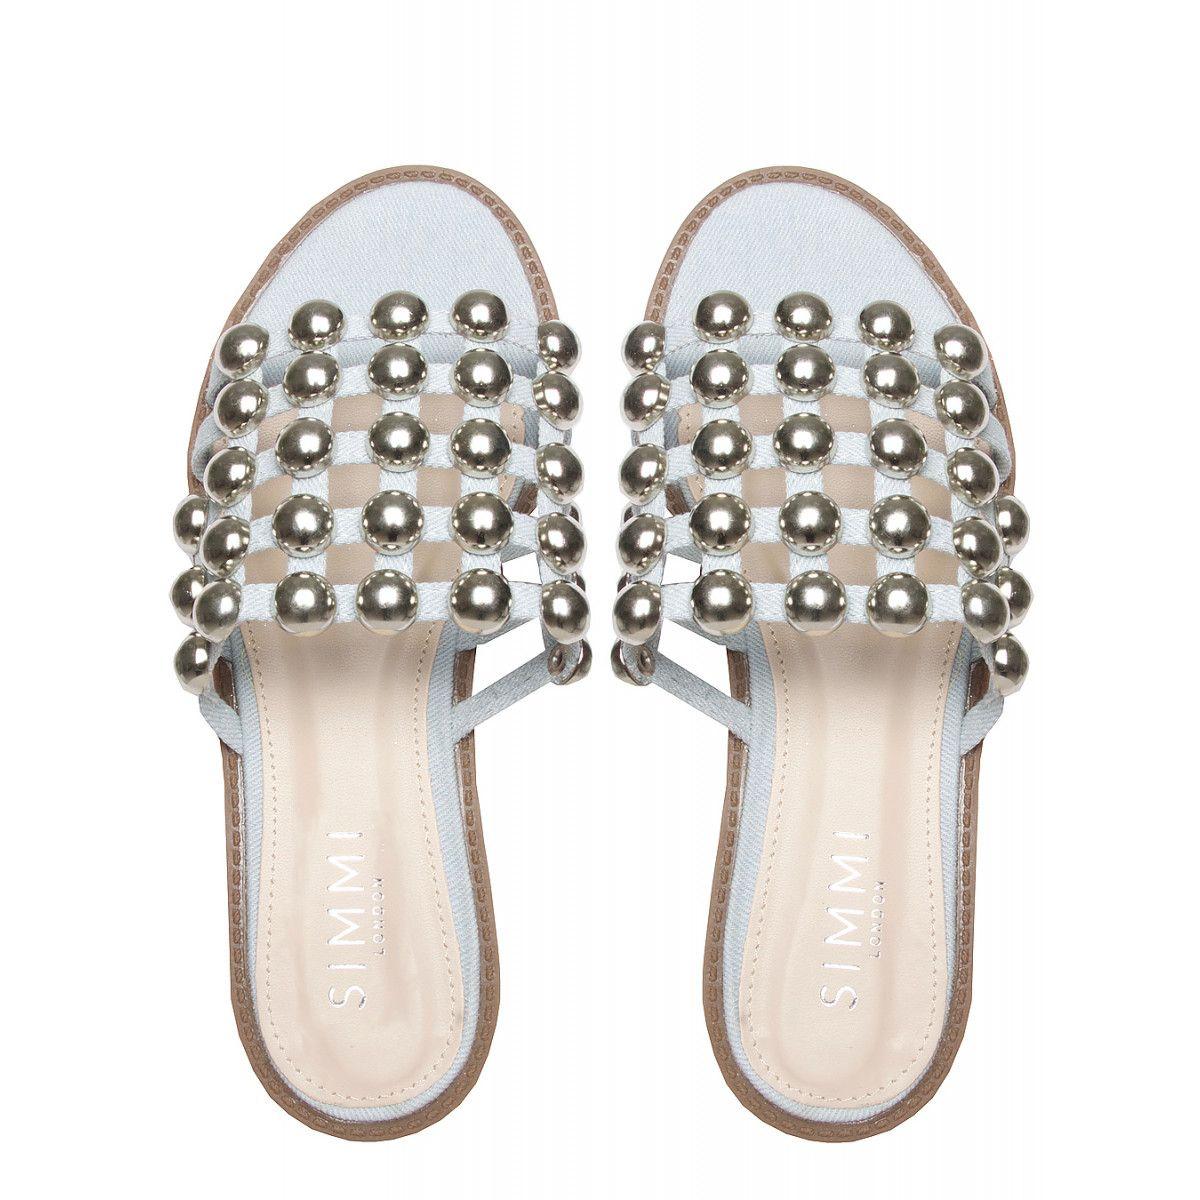 ef3f881c7a7 Elise Light Denim Studded Sliders : Simmi Shoes | My Shoe Game is ...